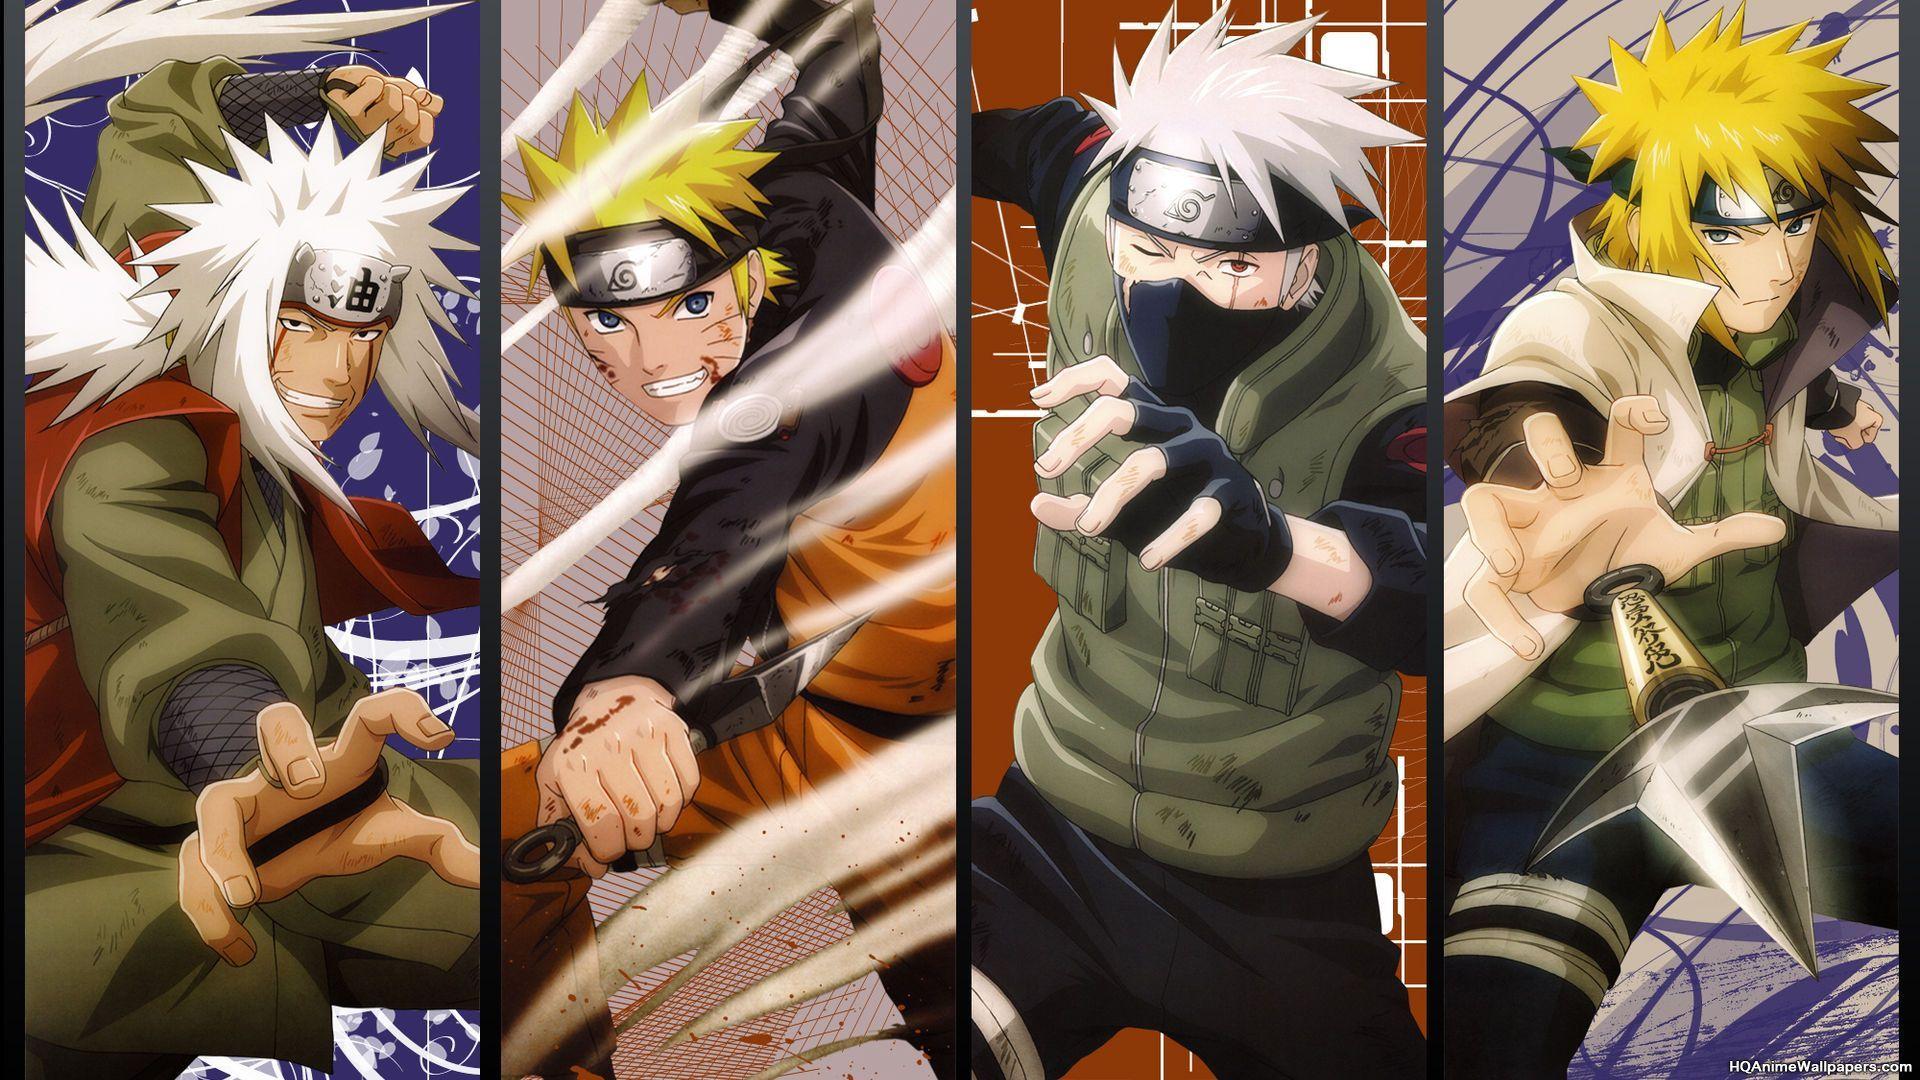 Naruto Wallpaper 19201080 Naruto Wallpapers HD 19201080 49